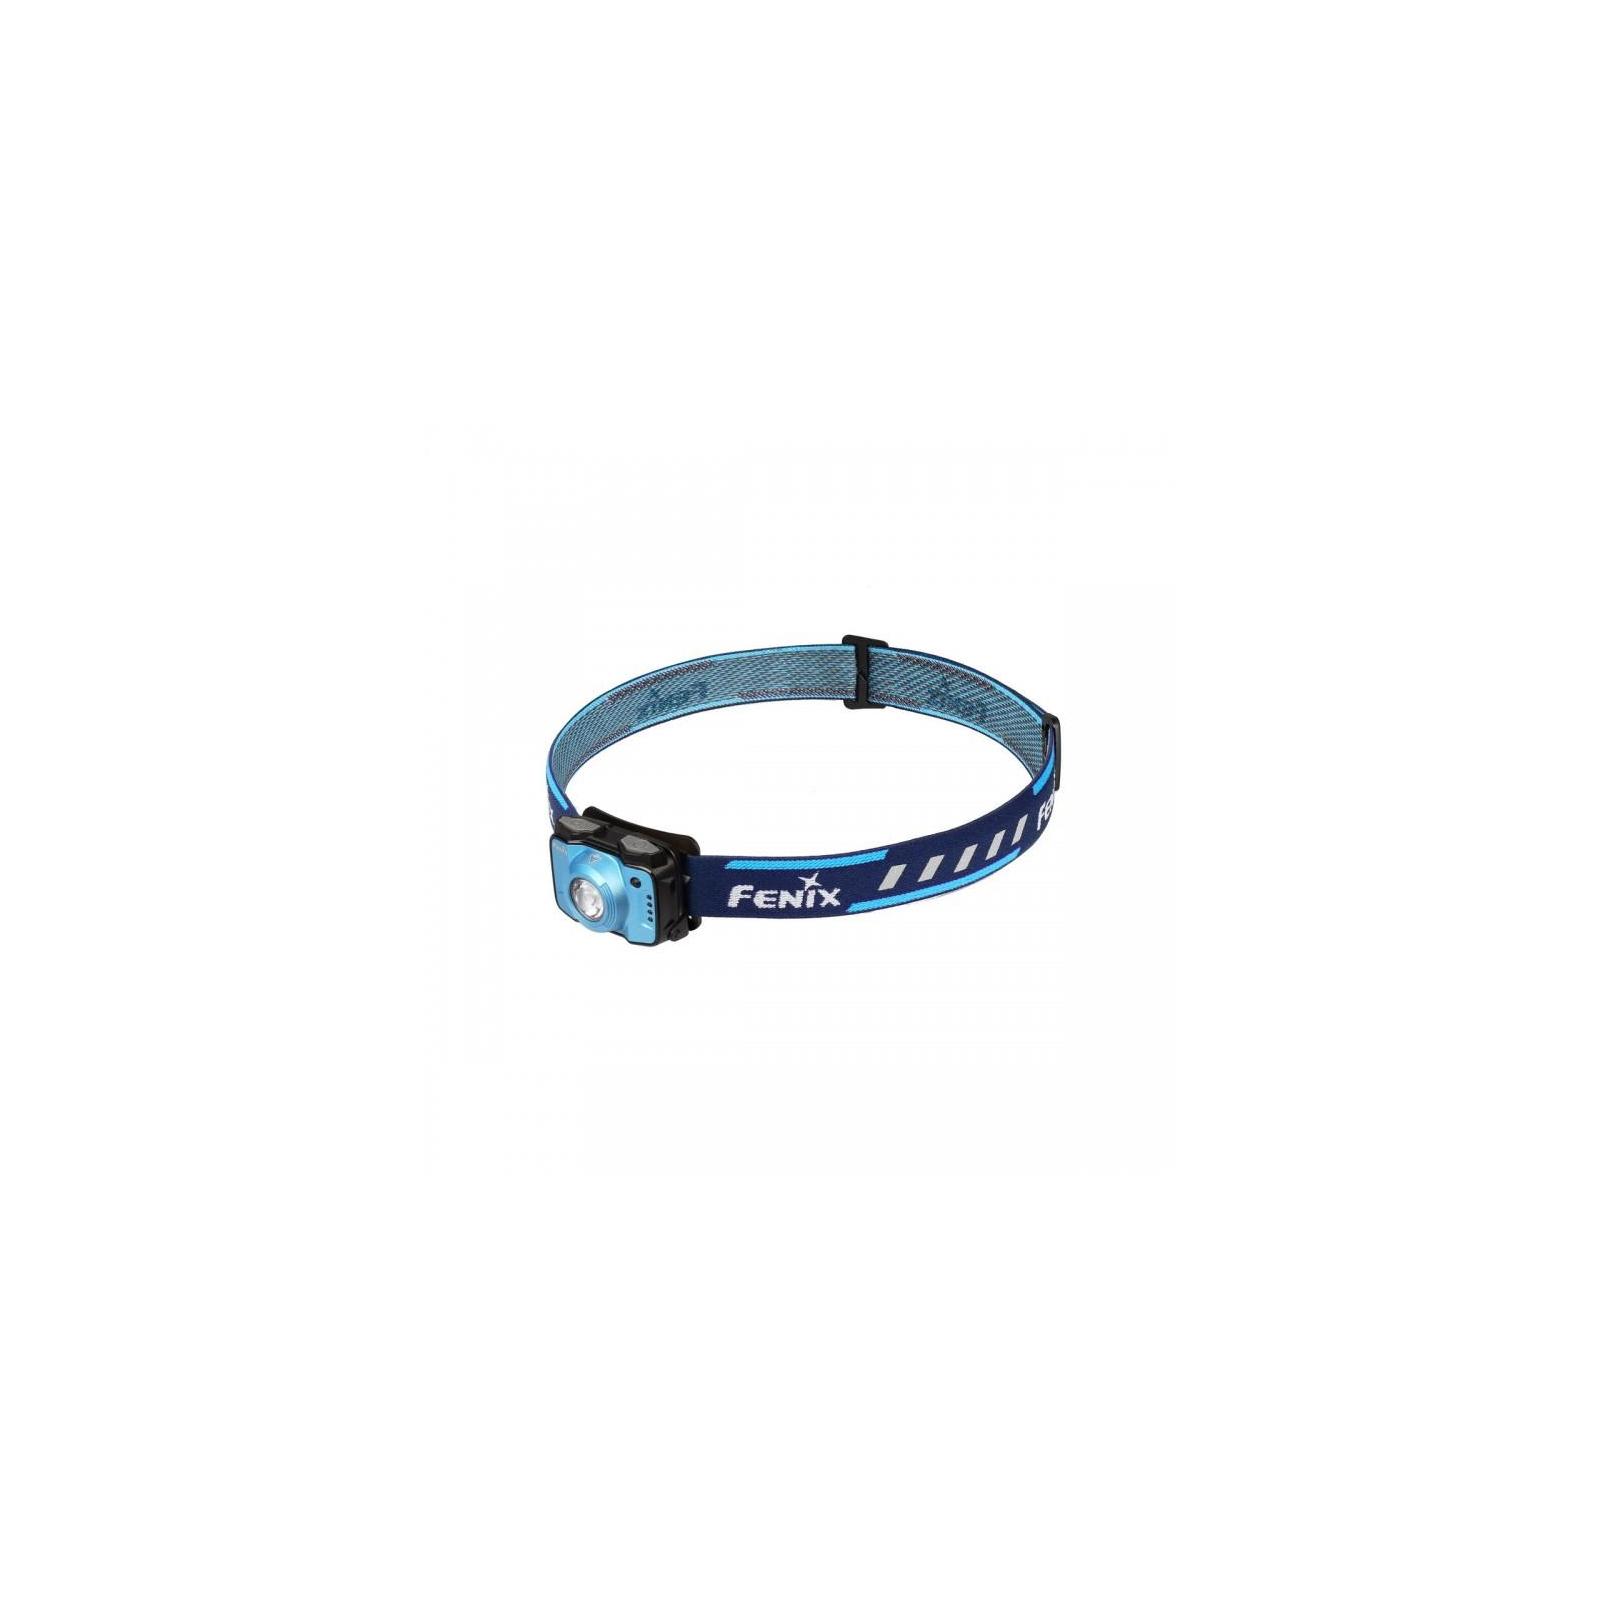 Фонарь Fenix HL12R голубой (HL12Rb)